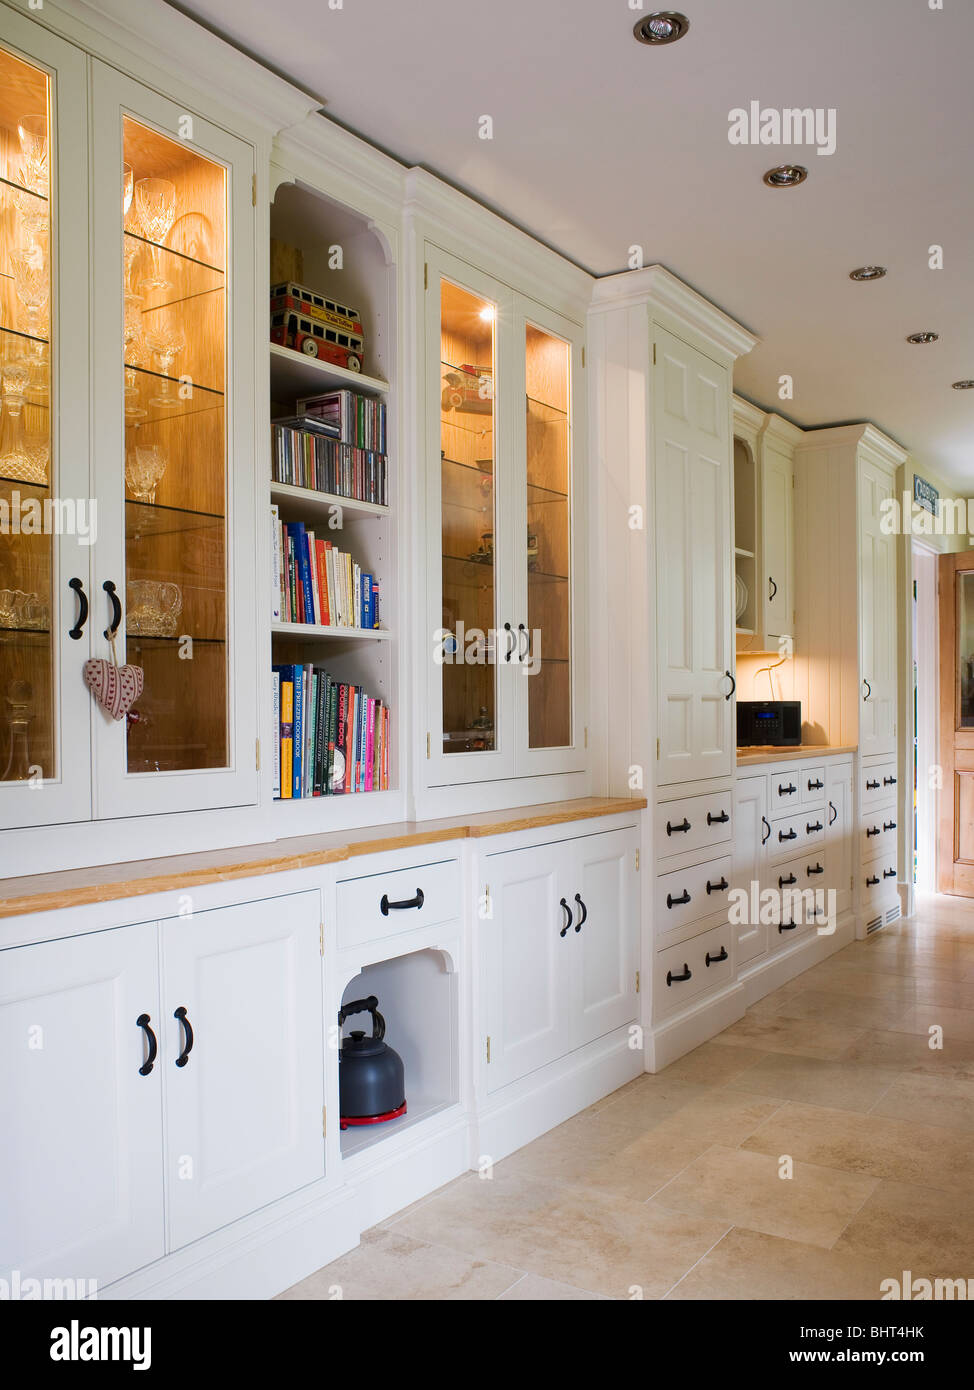 Interiors Kitchen Monochromatic Lighting Stockfotos & Interiors ...